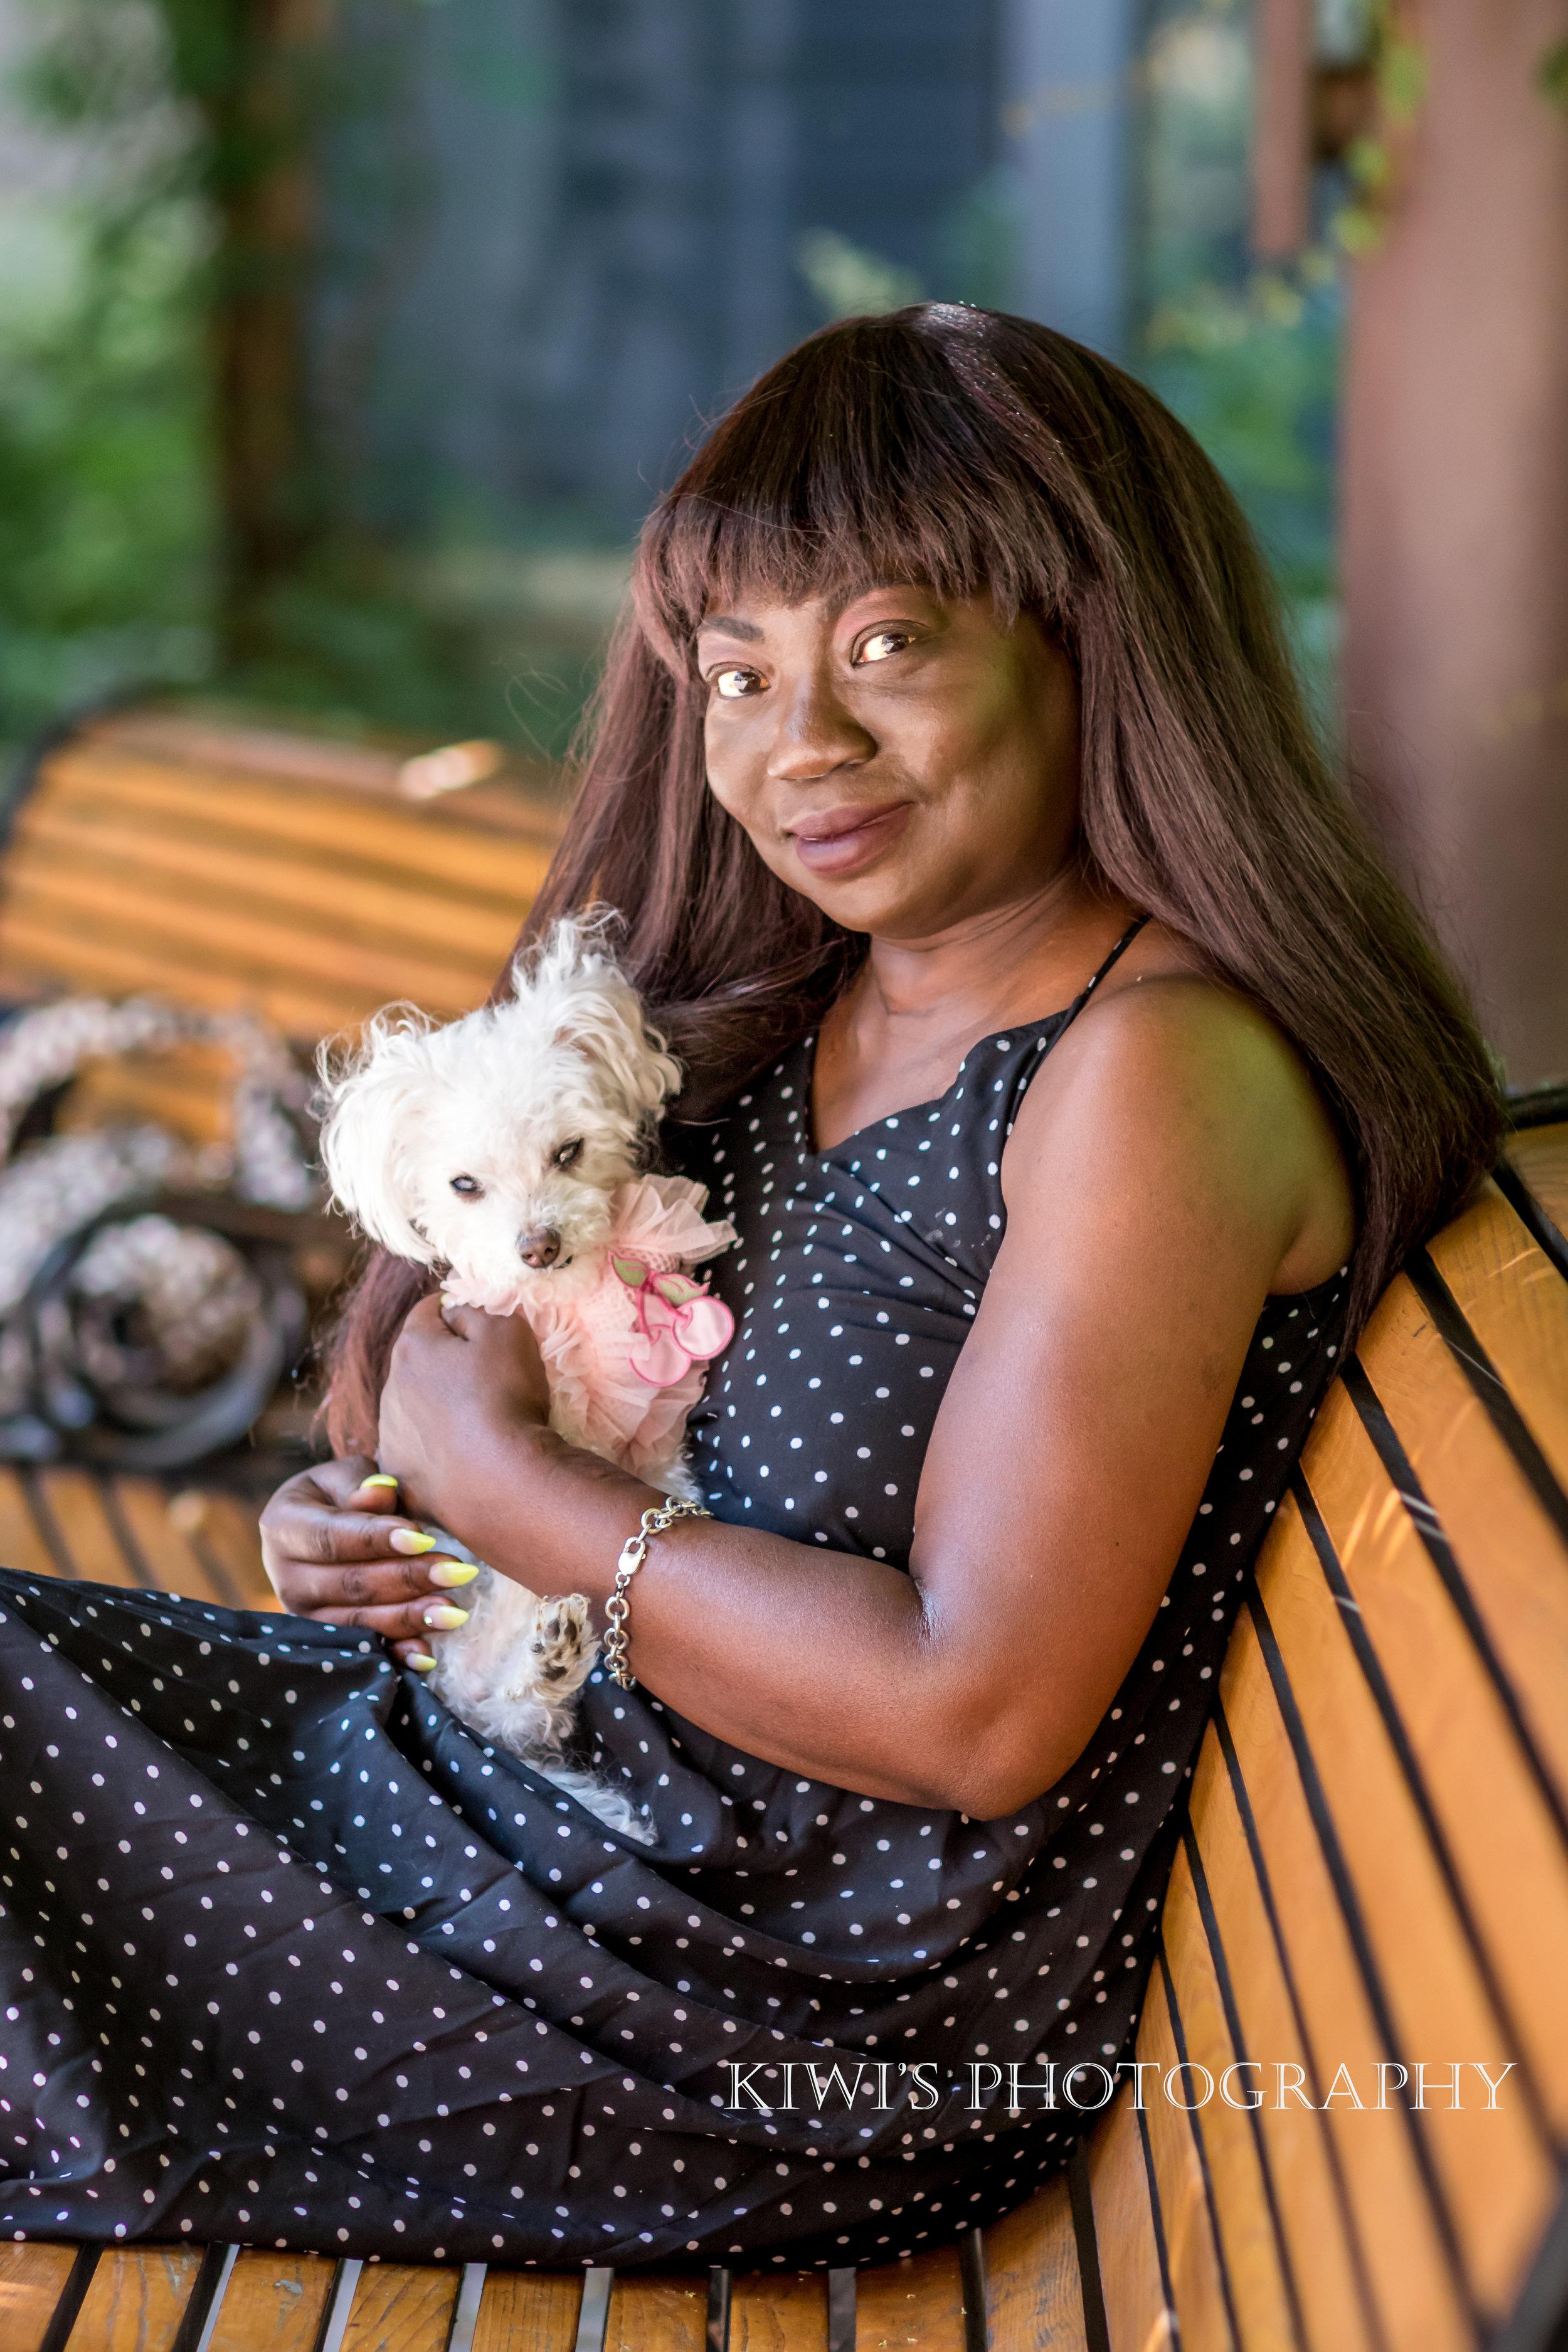 How I Met my Best Friend Photo Project - Florence & Peanut - Ottawa, Canada